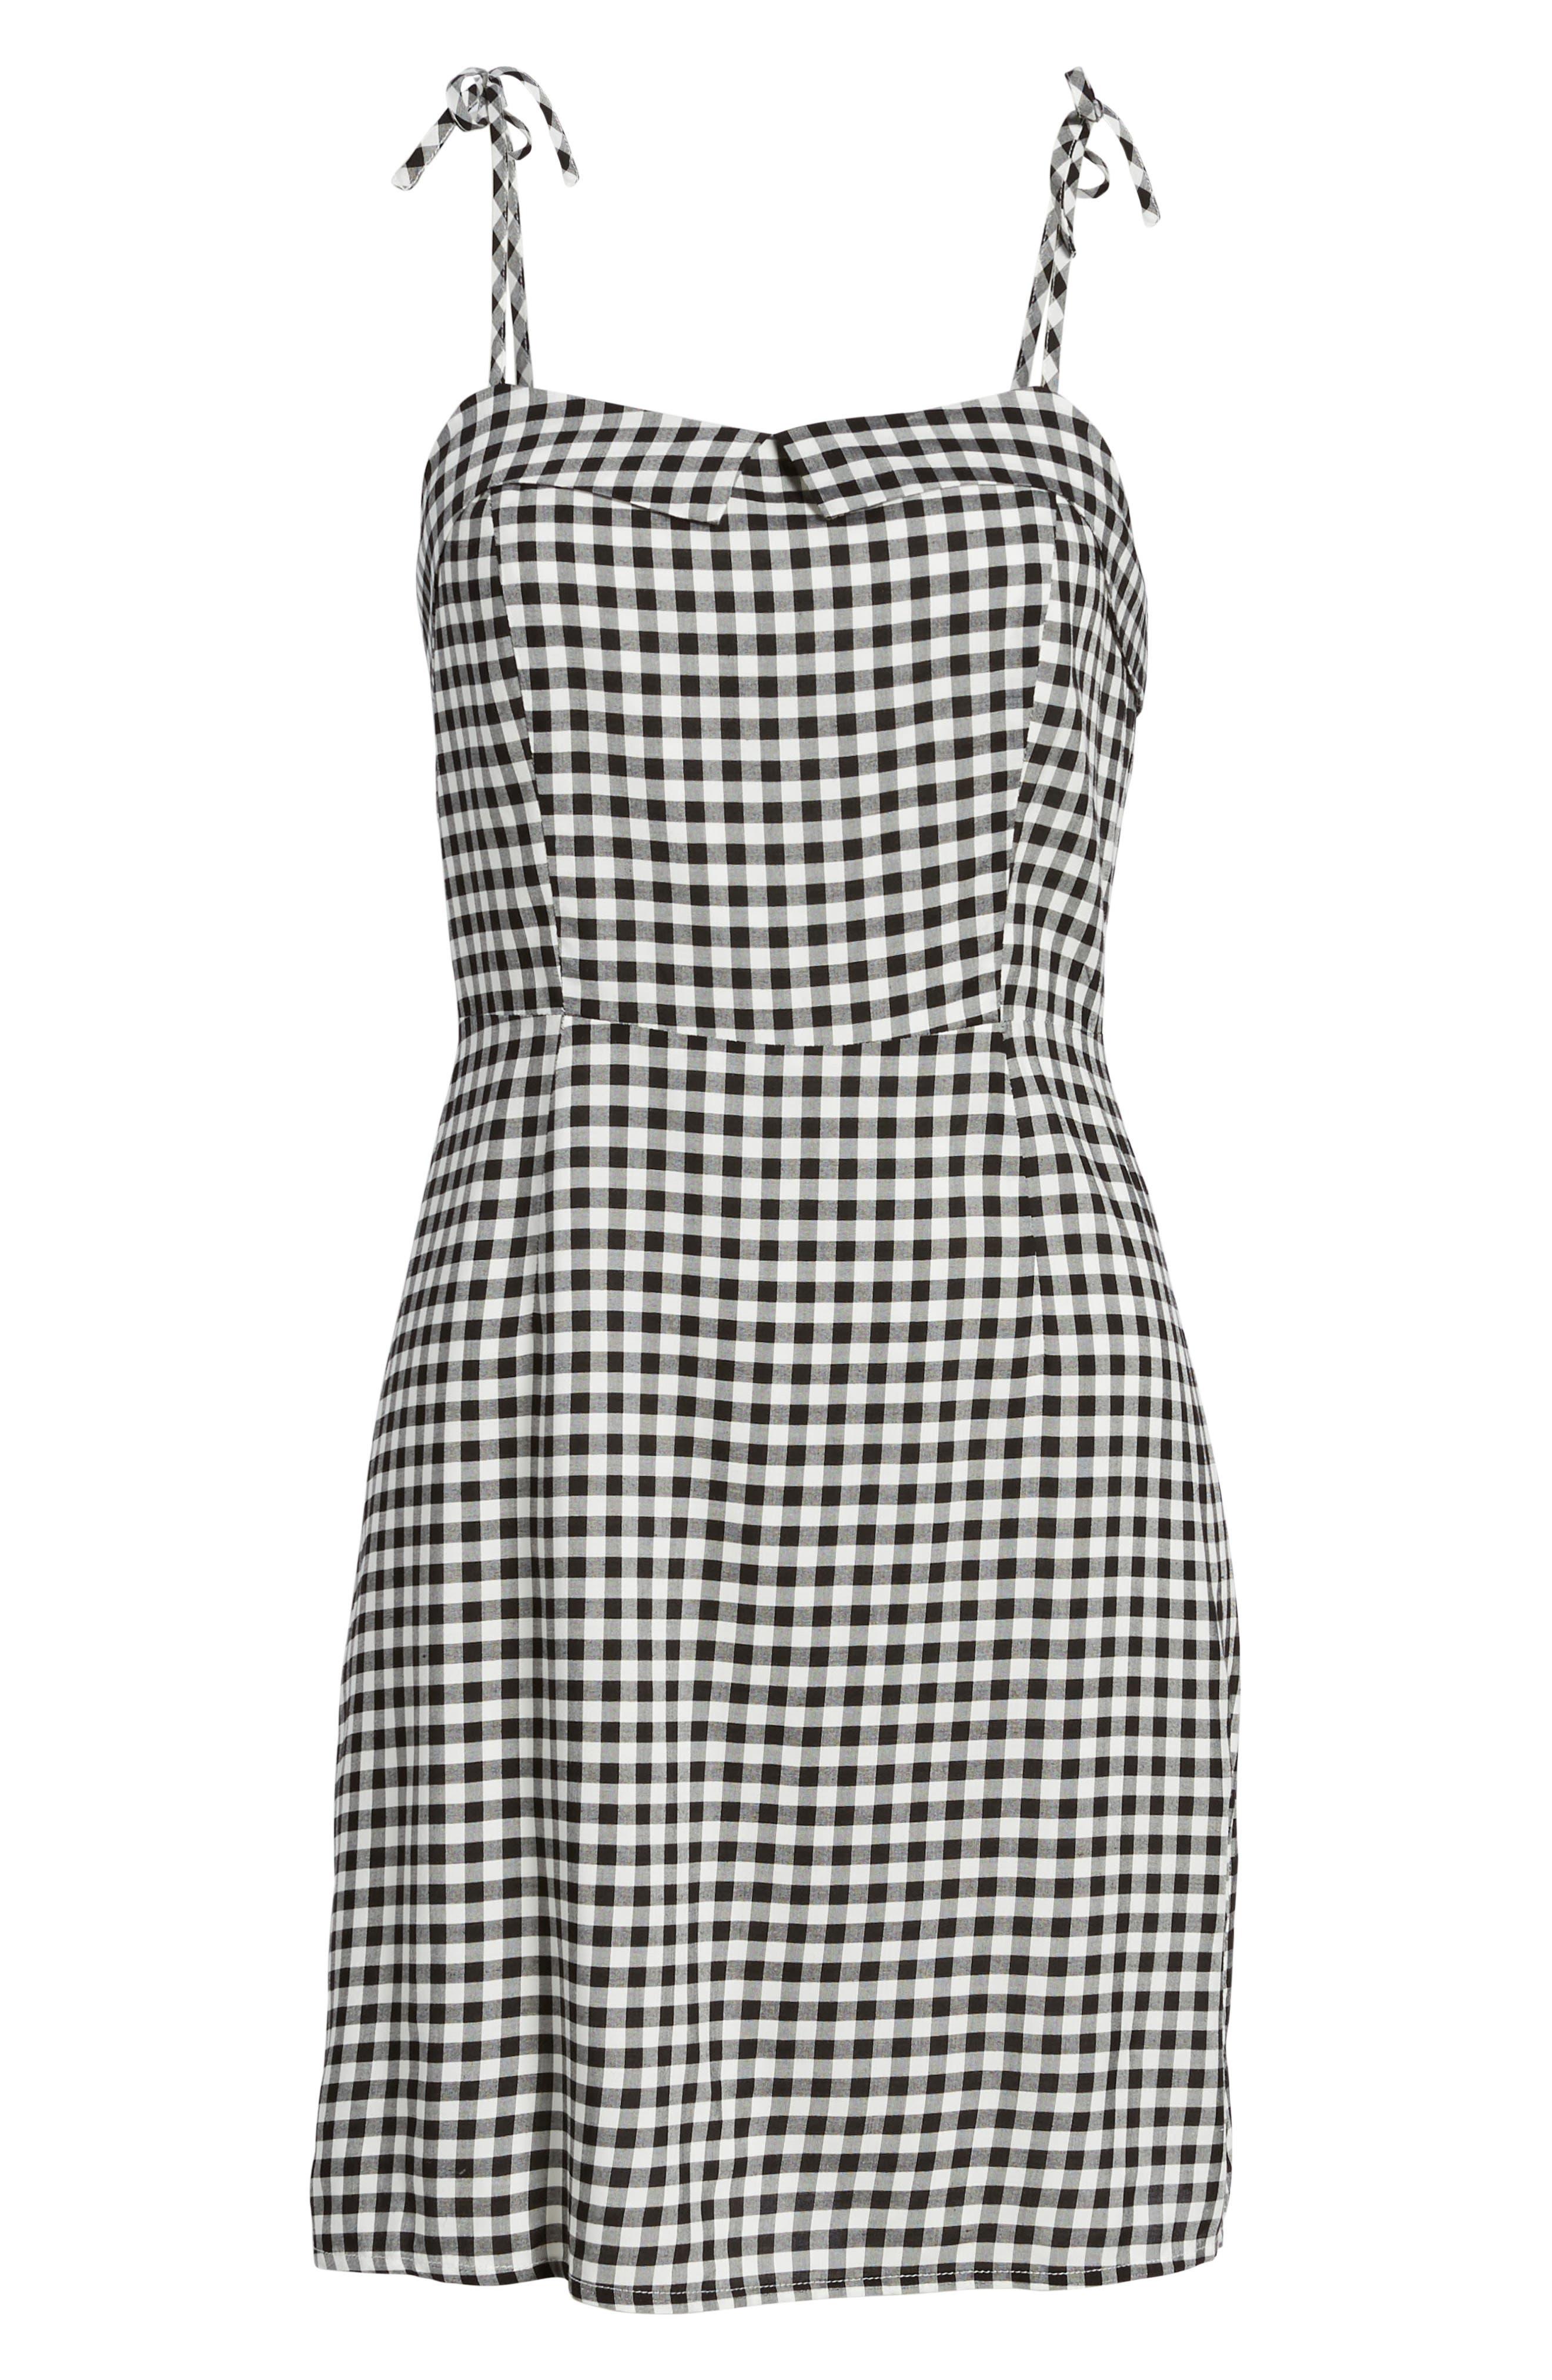 Eddie Gingham Dress,                             Alternate thumbnail 6, color,                             BLACK